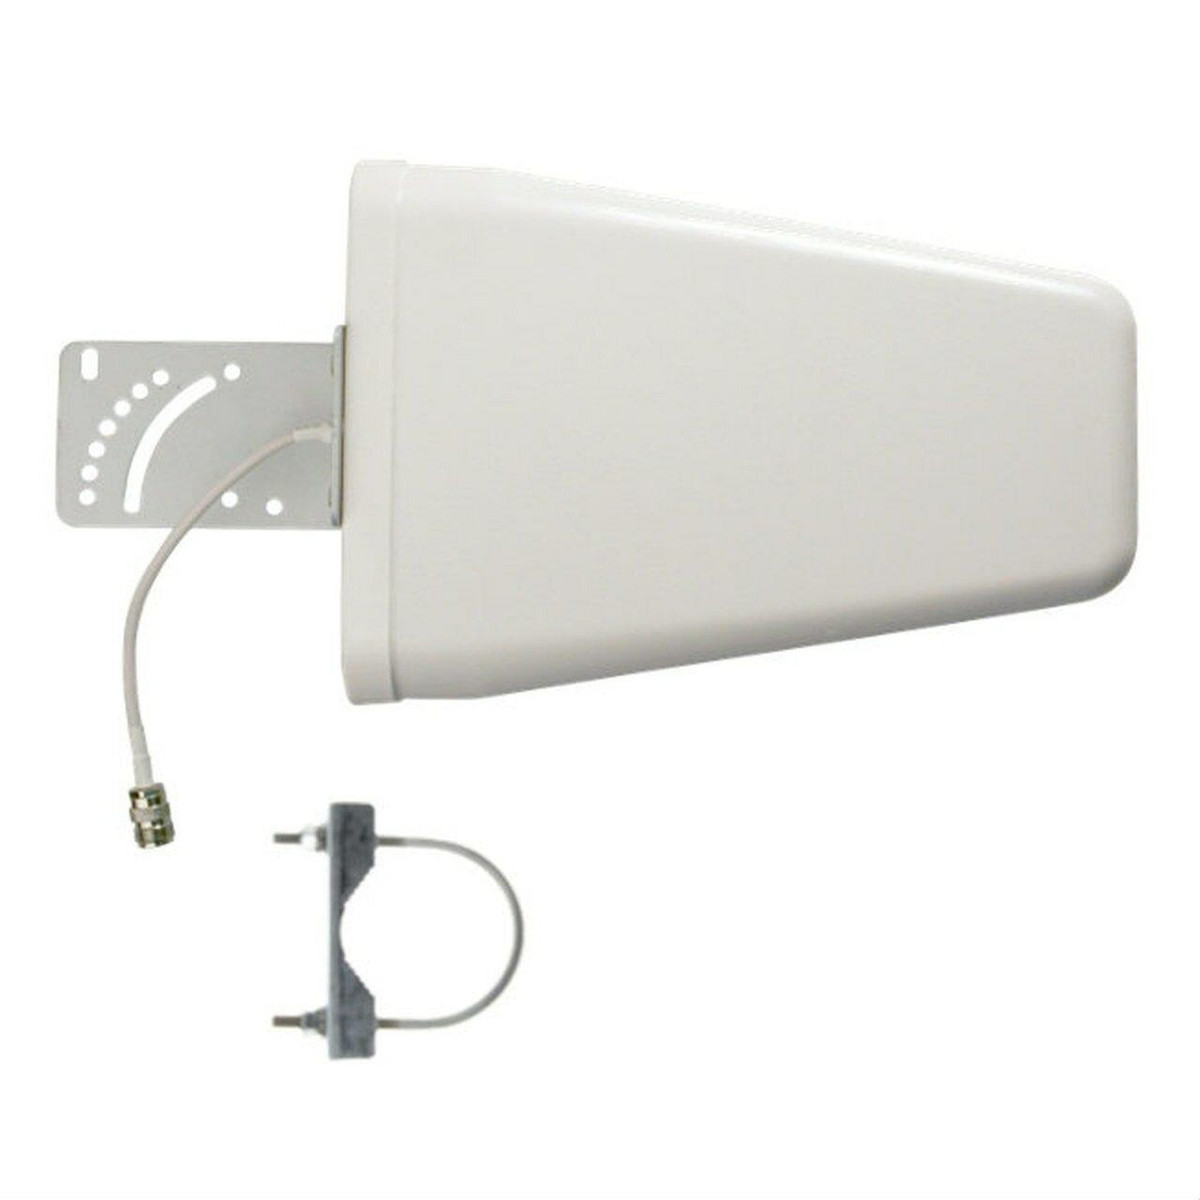 Hotspot M2M SMA Yagi Antenna Signal Booster Kit